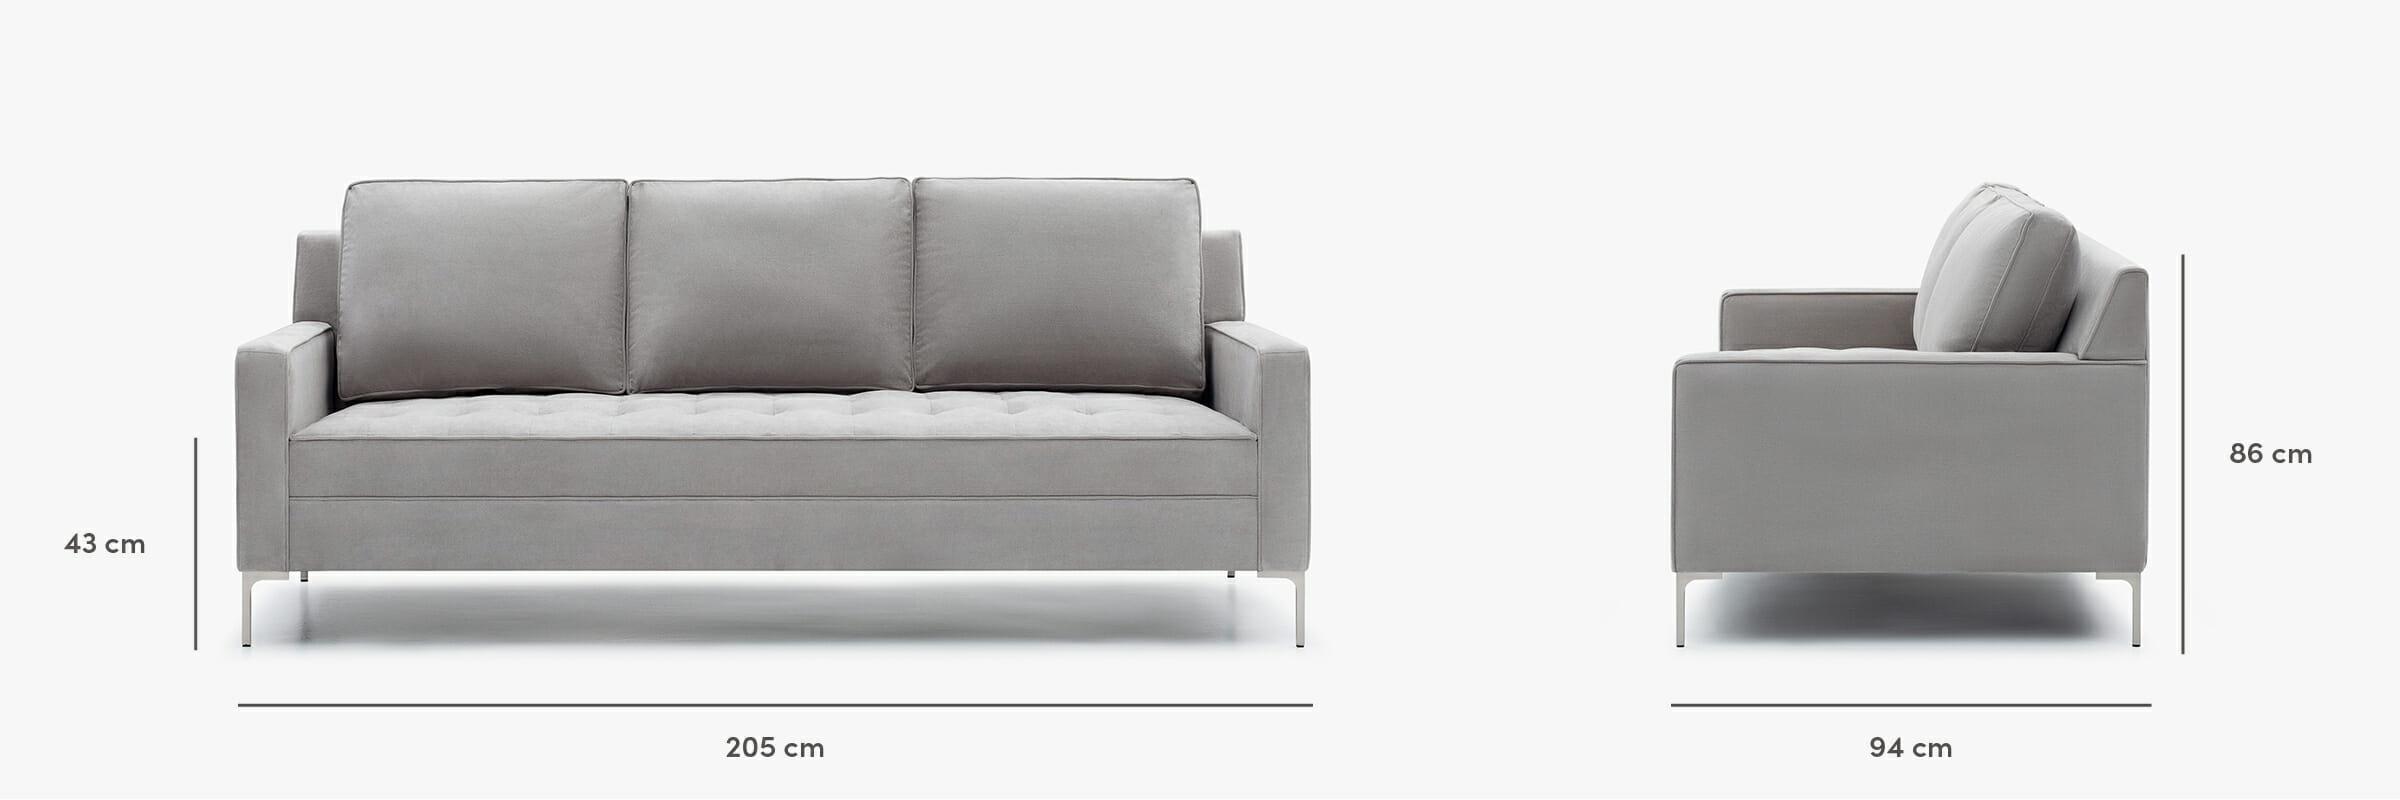 Hudson sofa dimensions